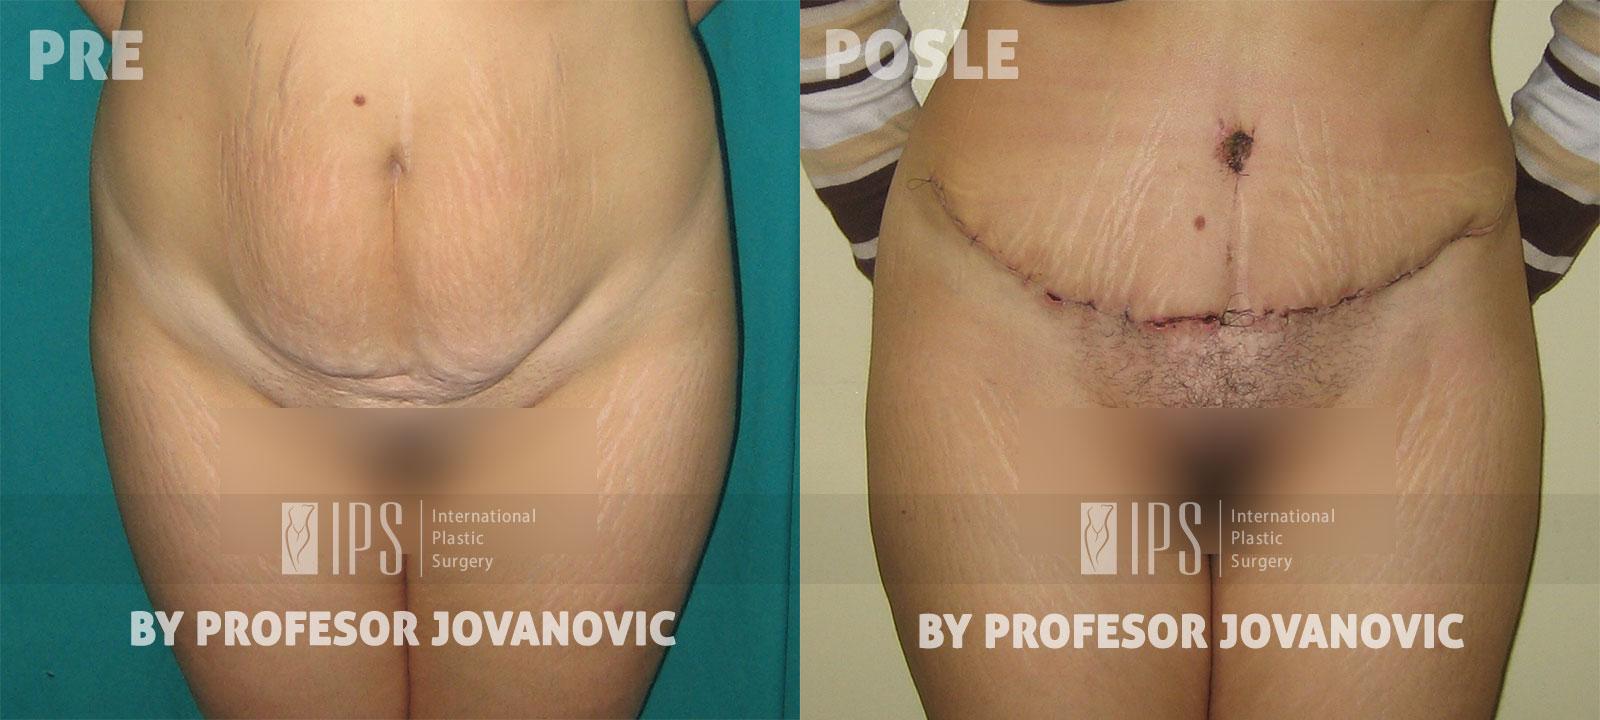 Zatezanje stomaka - pre i posle, napred